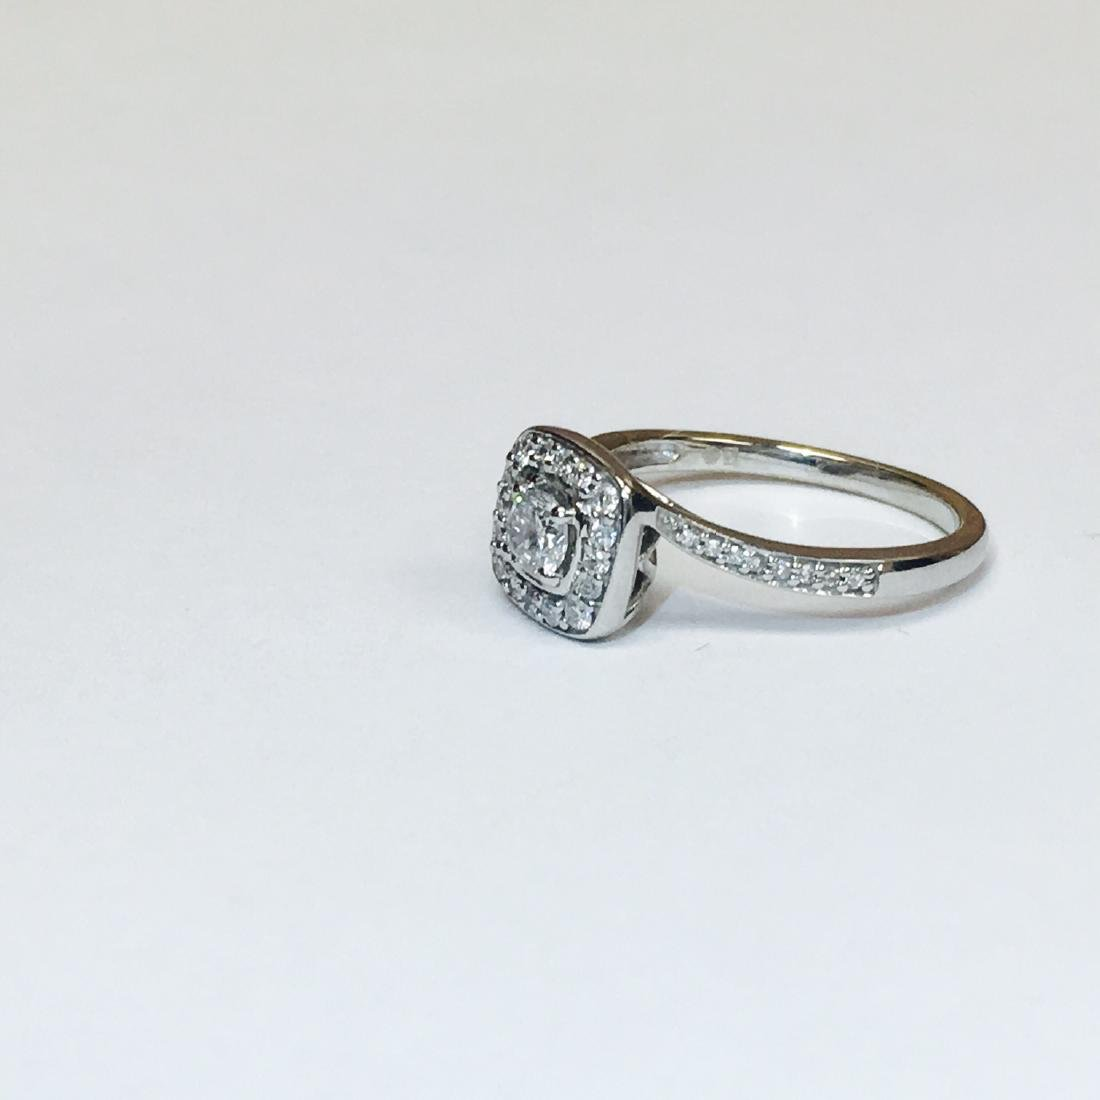 14K White Gold, VS 0.75 Carat Diamond Ring - 3